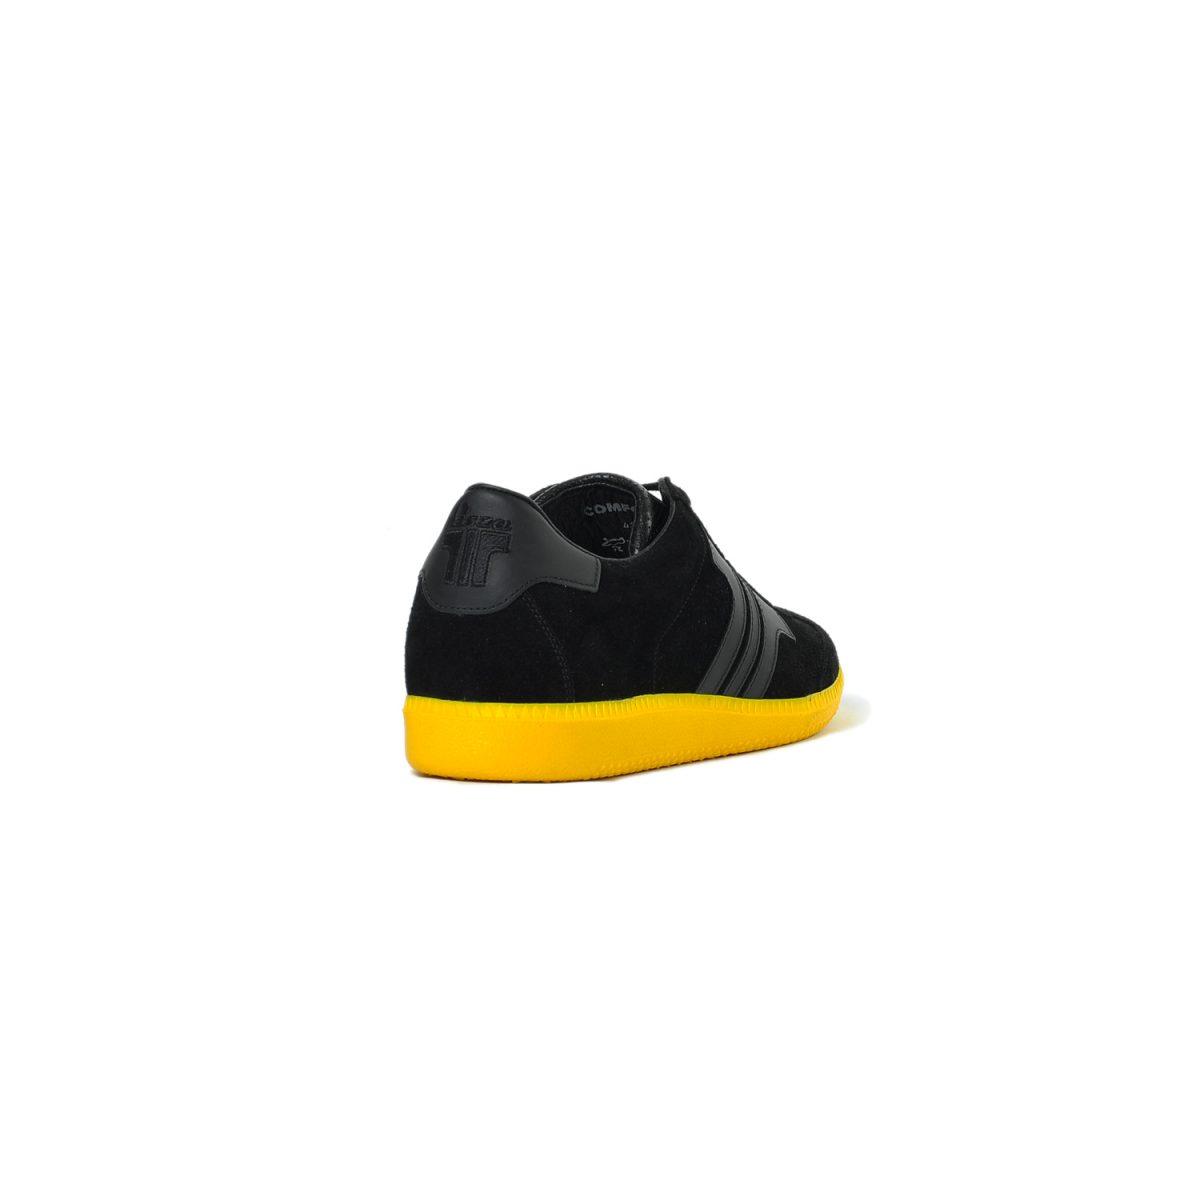 Tisza cipő - Comfort - Fekete-sárga